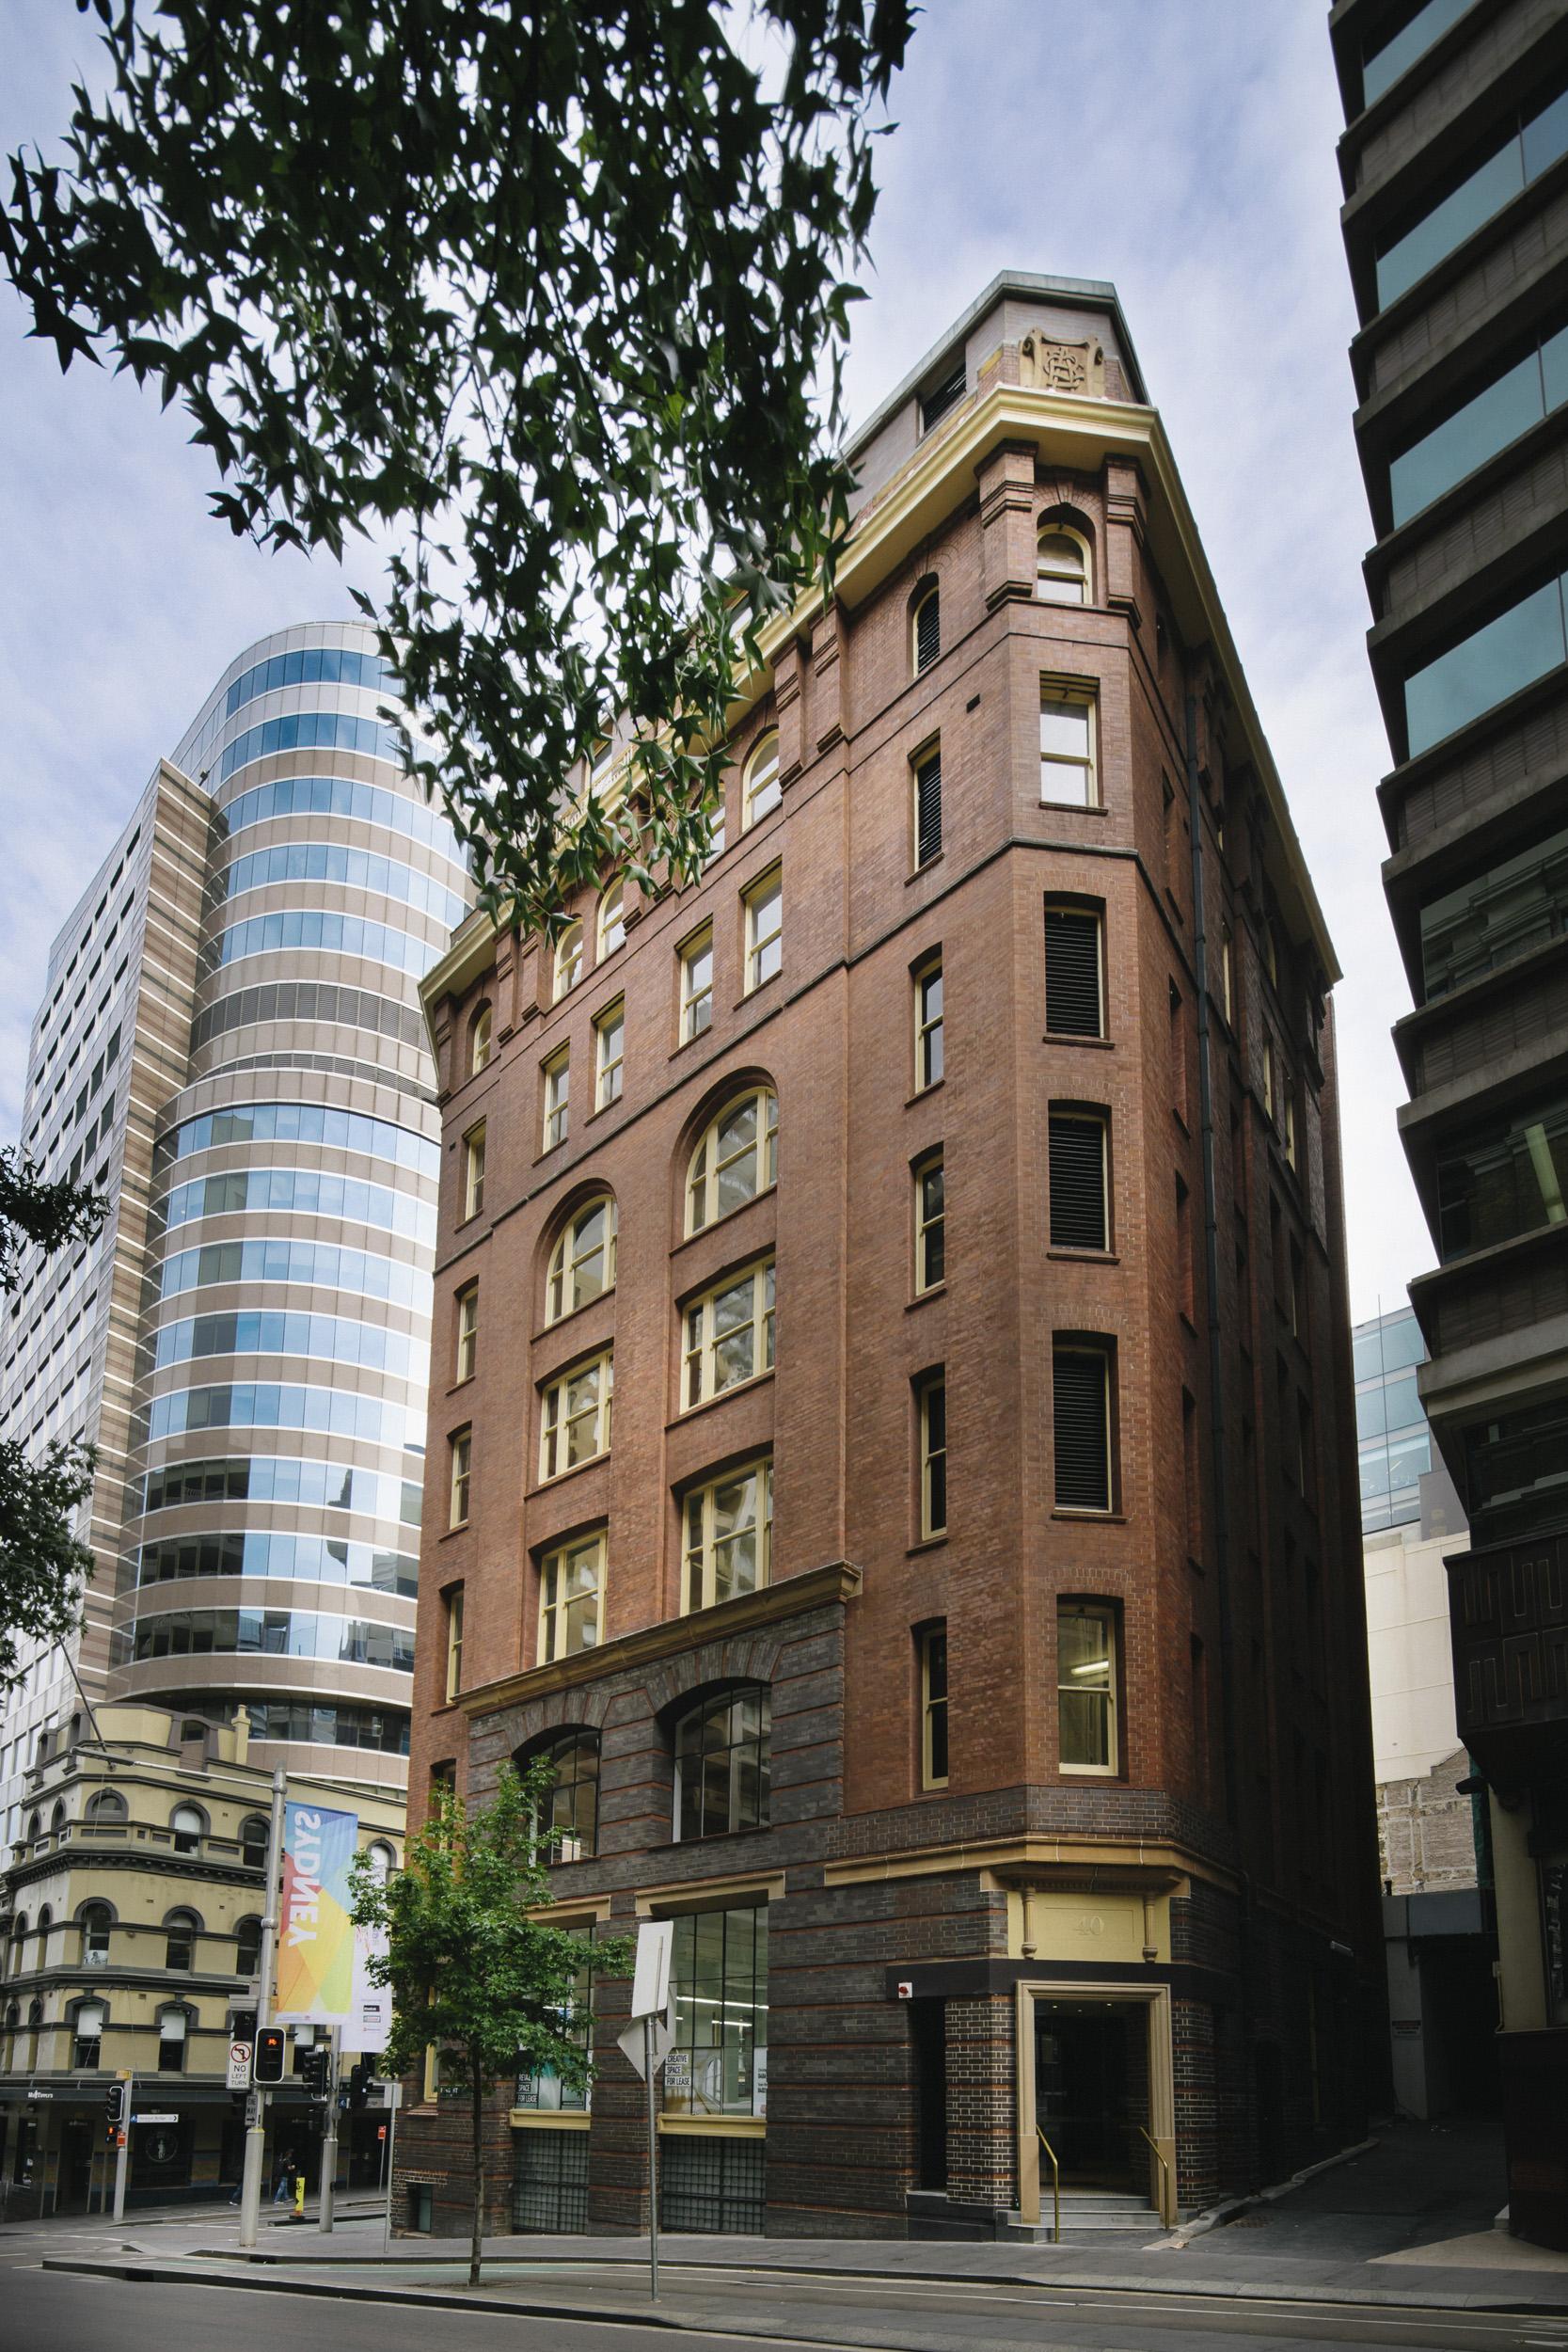 heritage_architecture_sydney_01.jpg